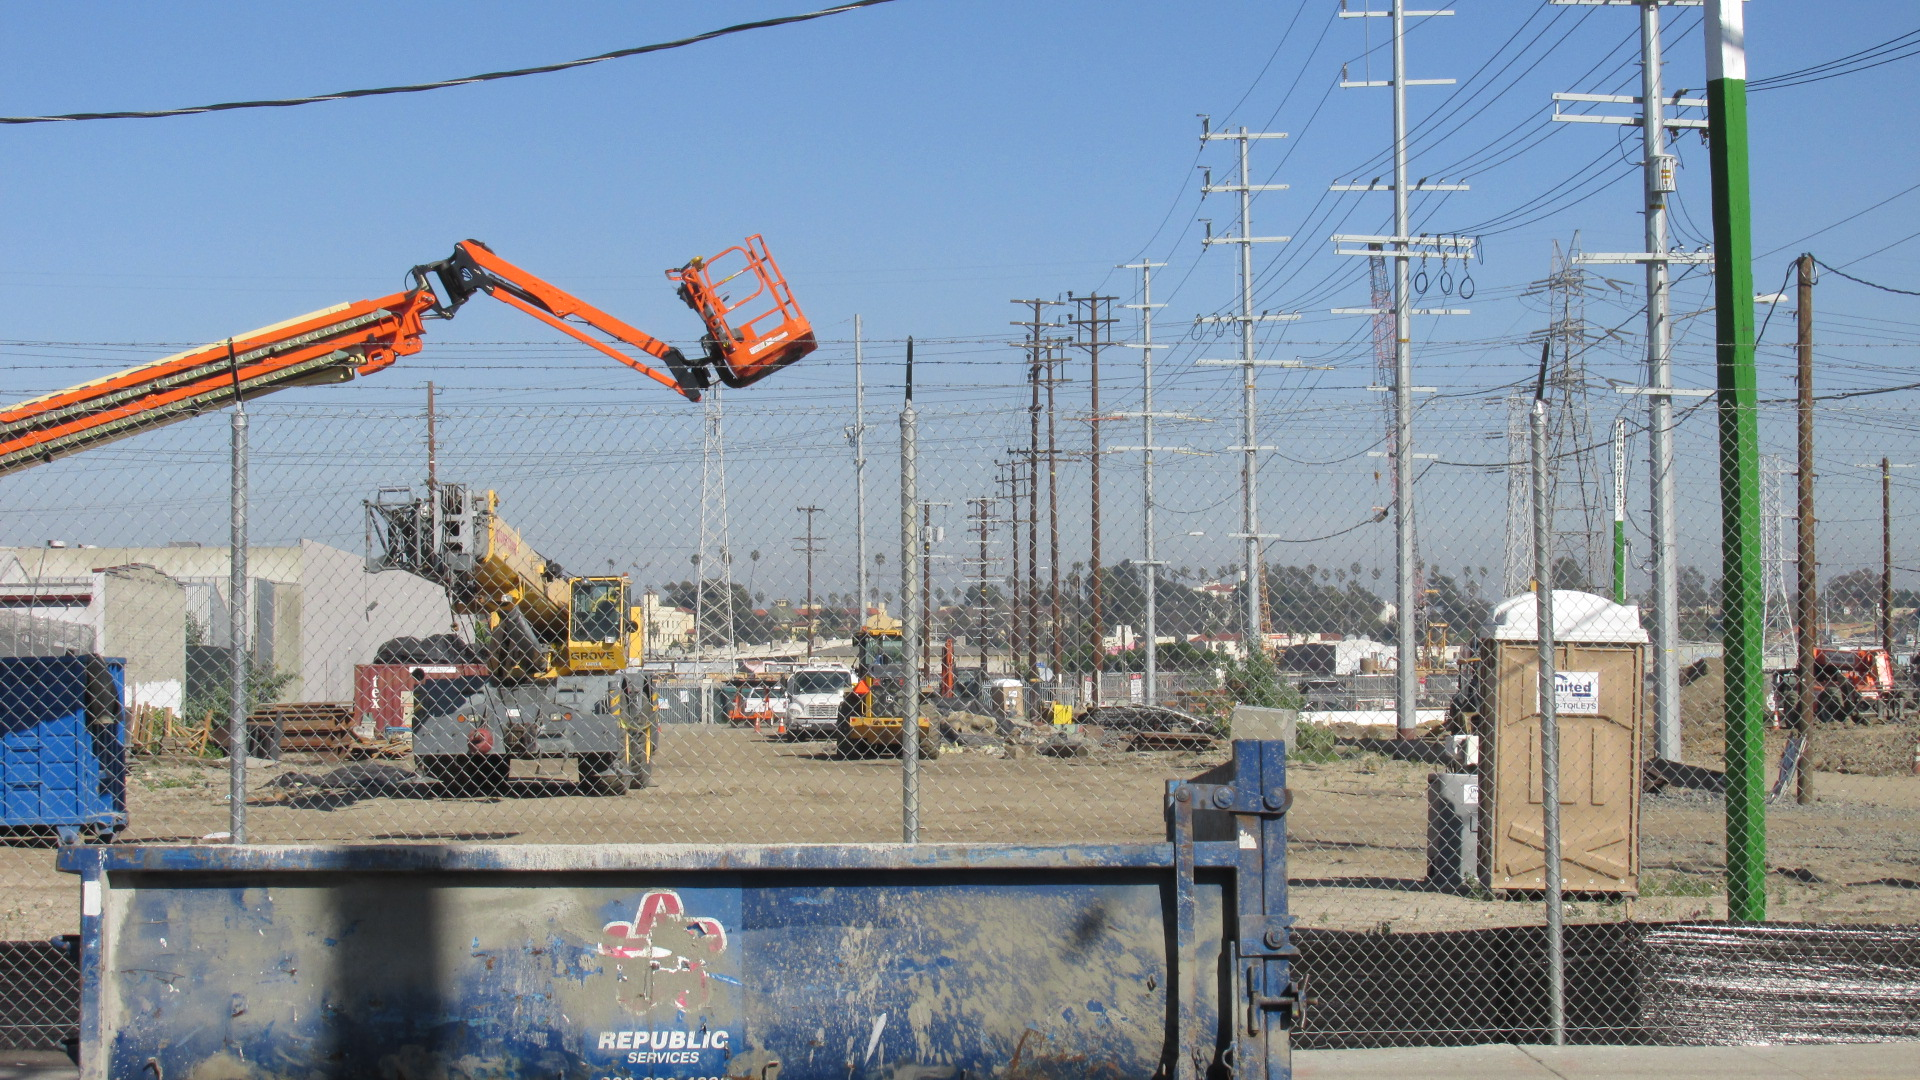 B6 1703 12 Orange Crane